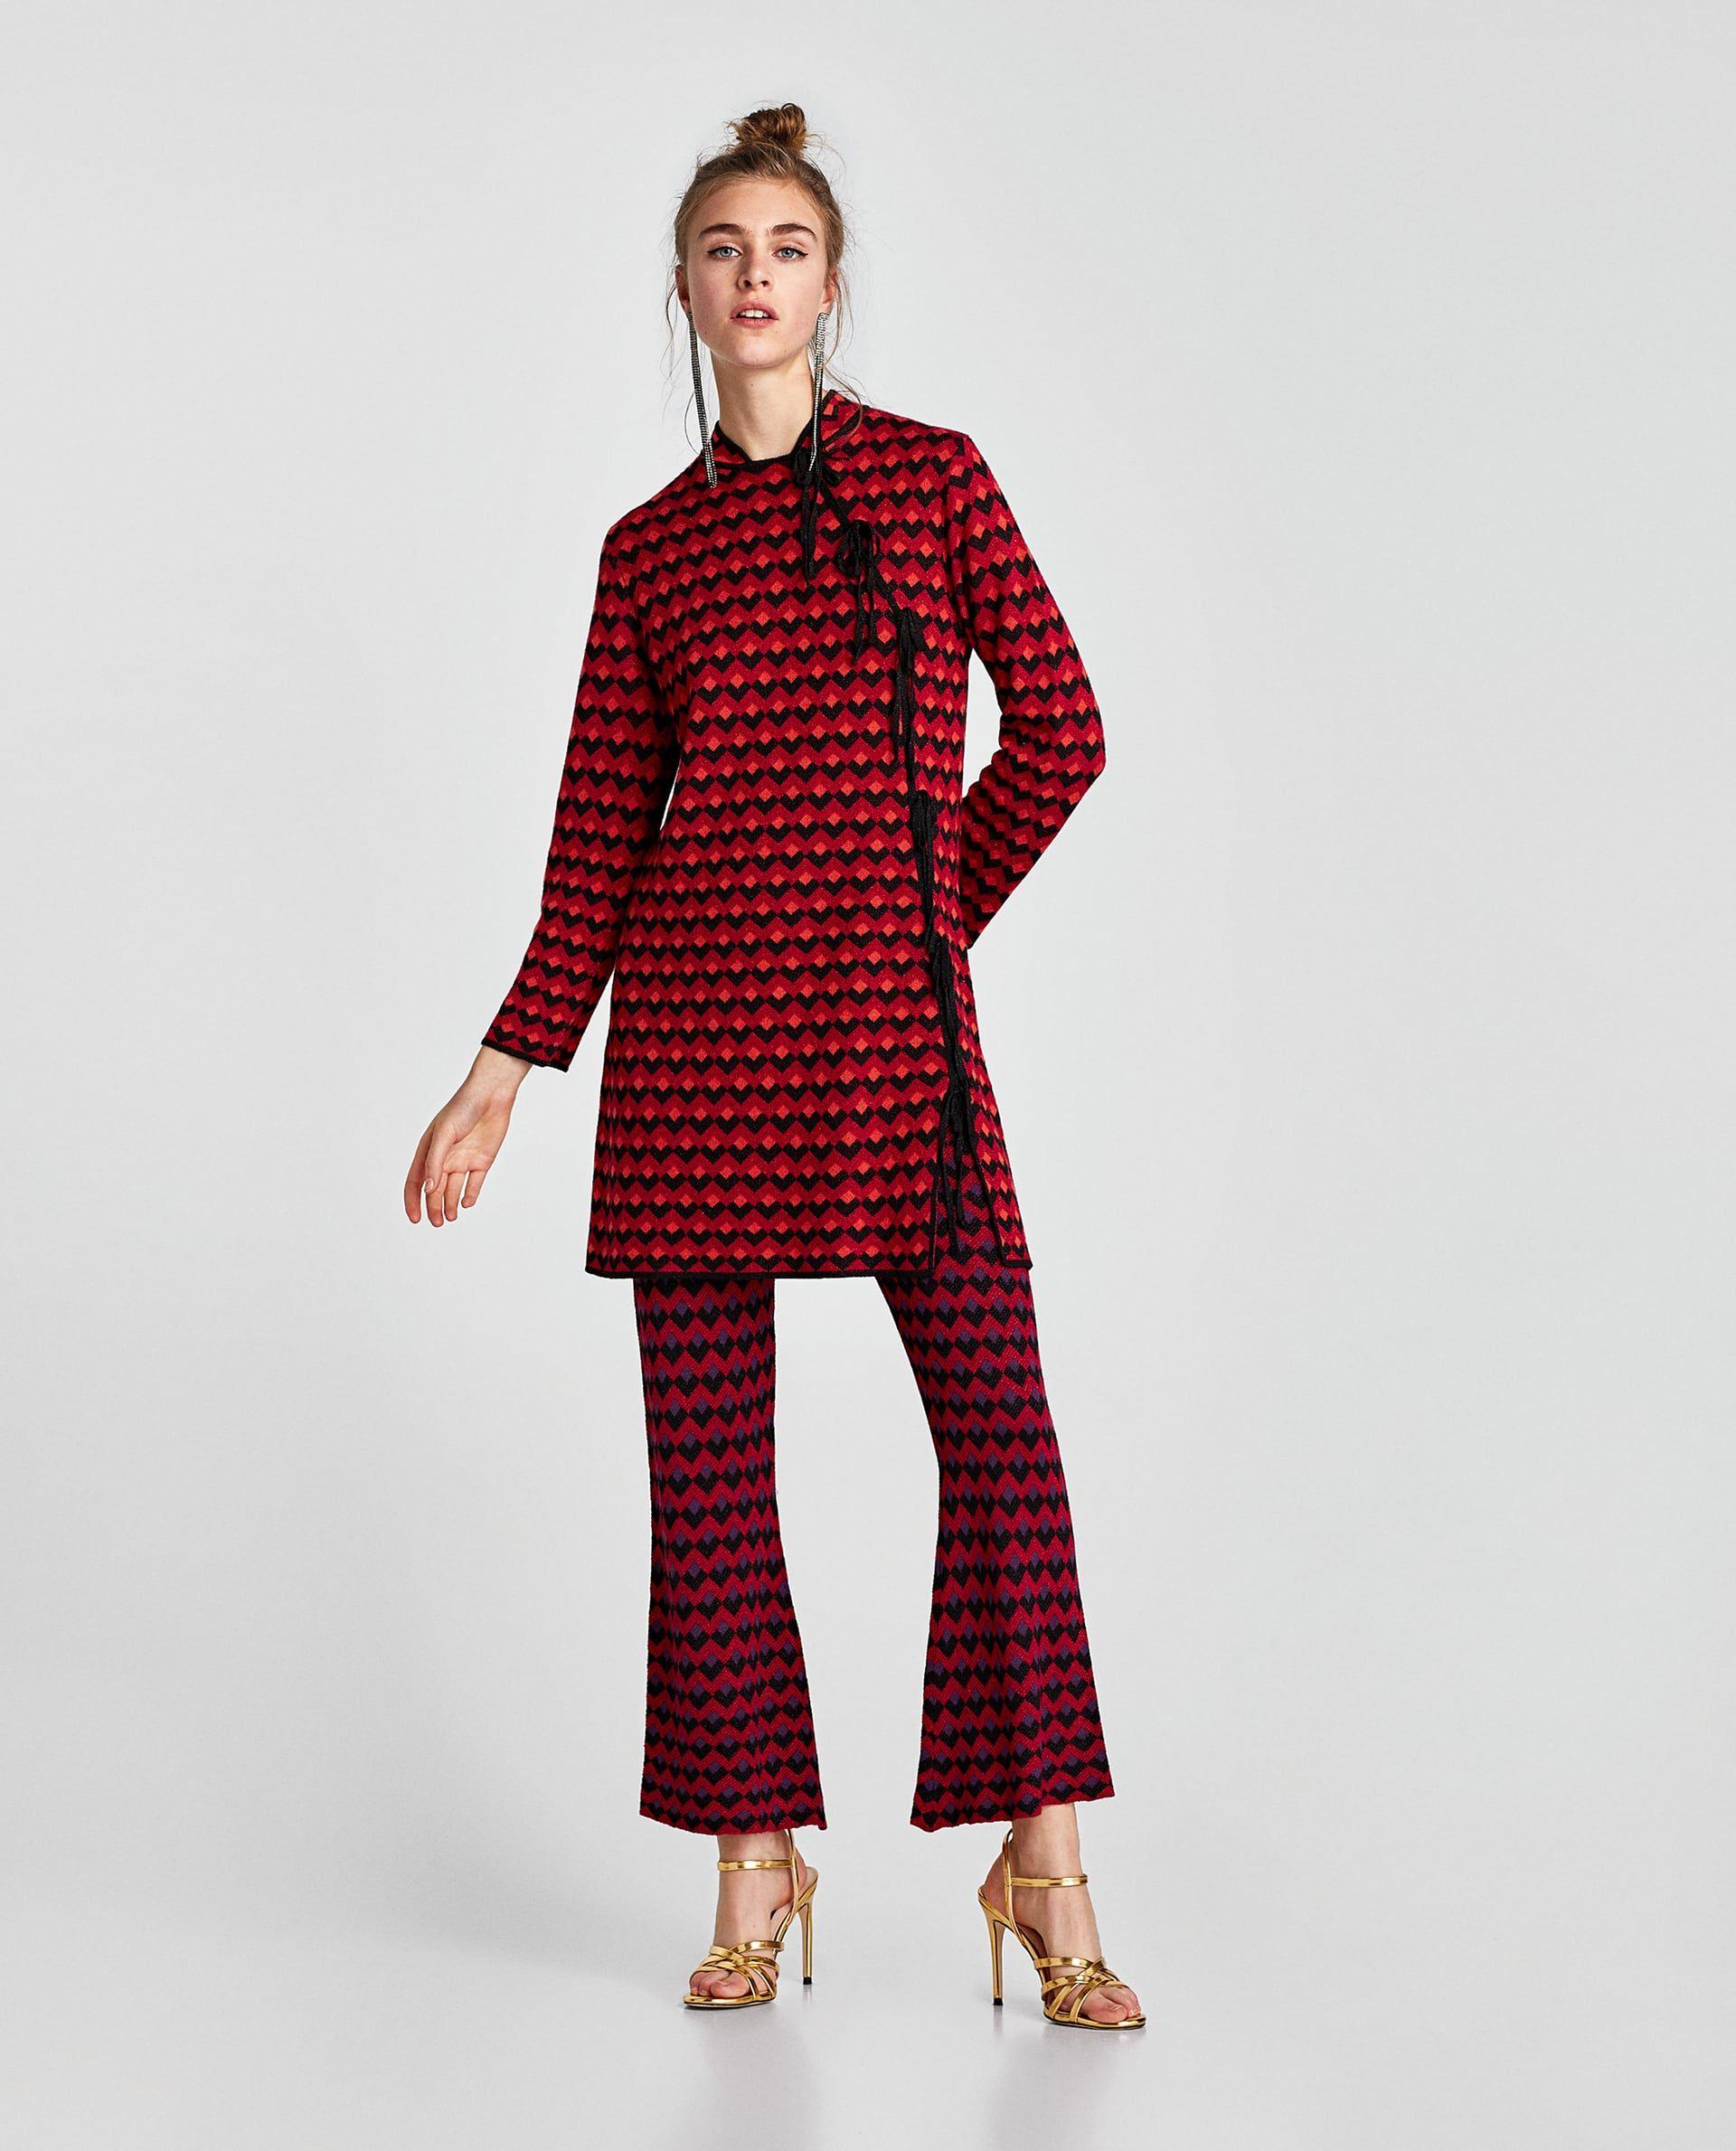 Pin by wahida on zara pinterest jacquard dress zara women and woman